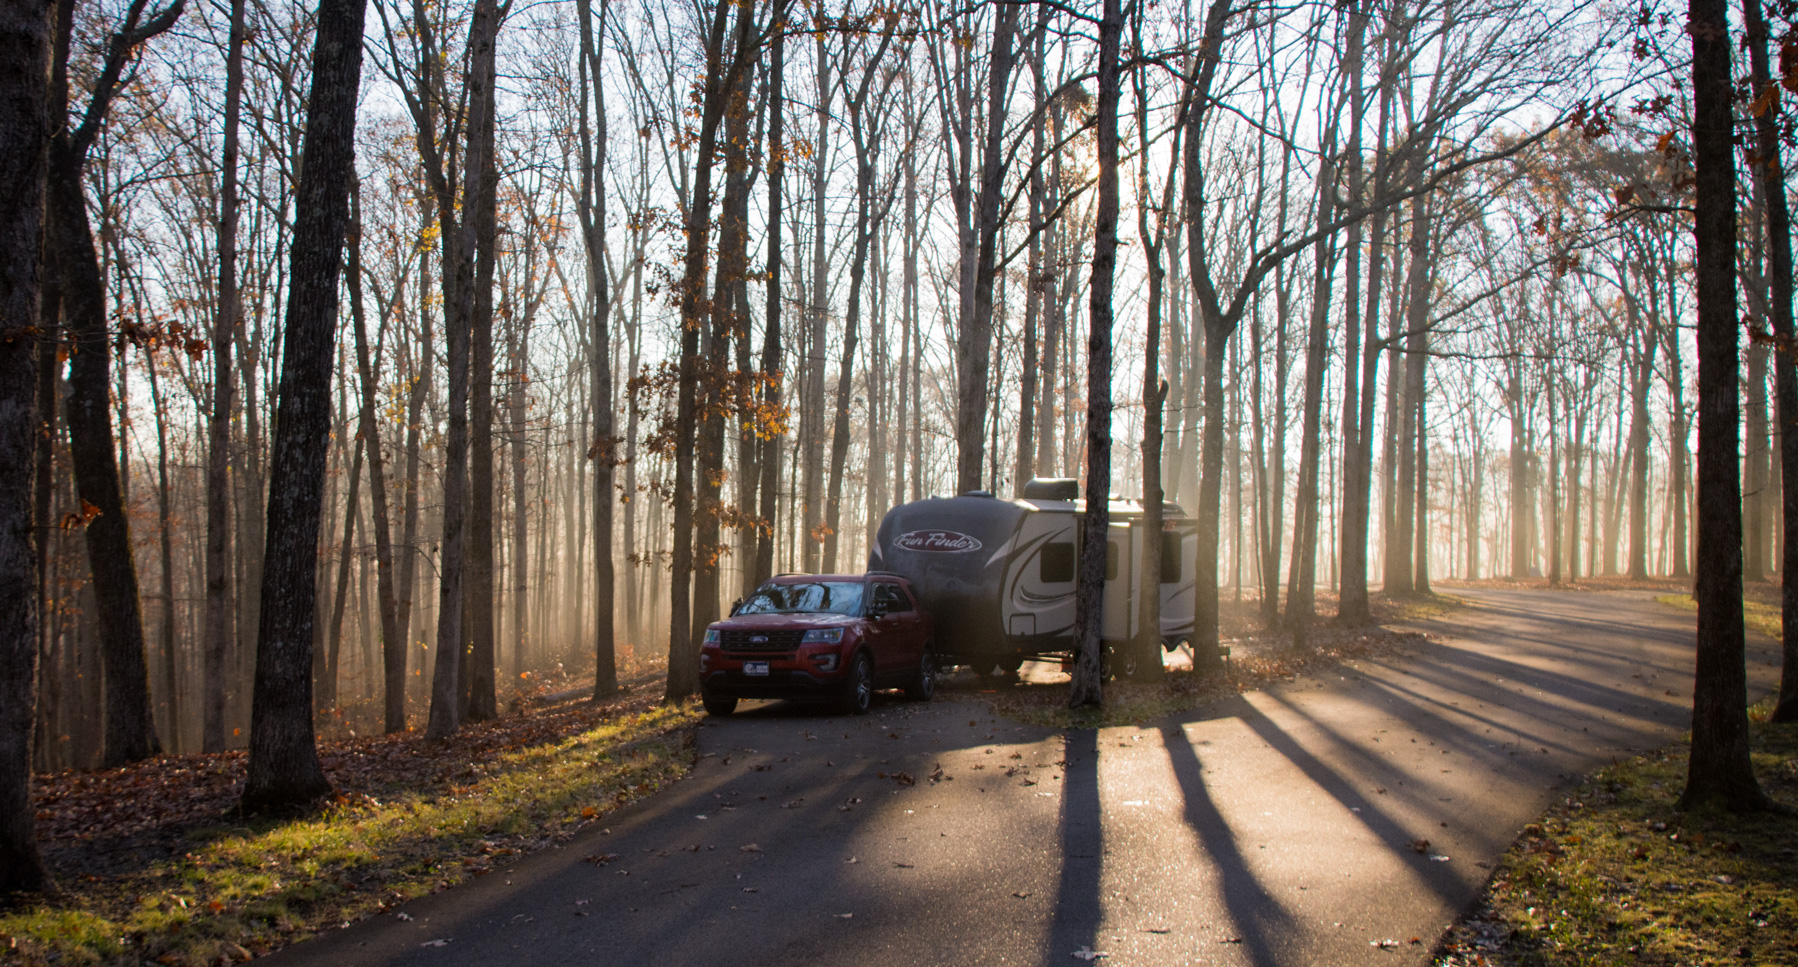 Meriwether lewis campsite 211172017